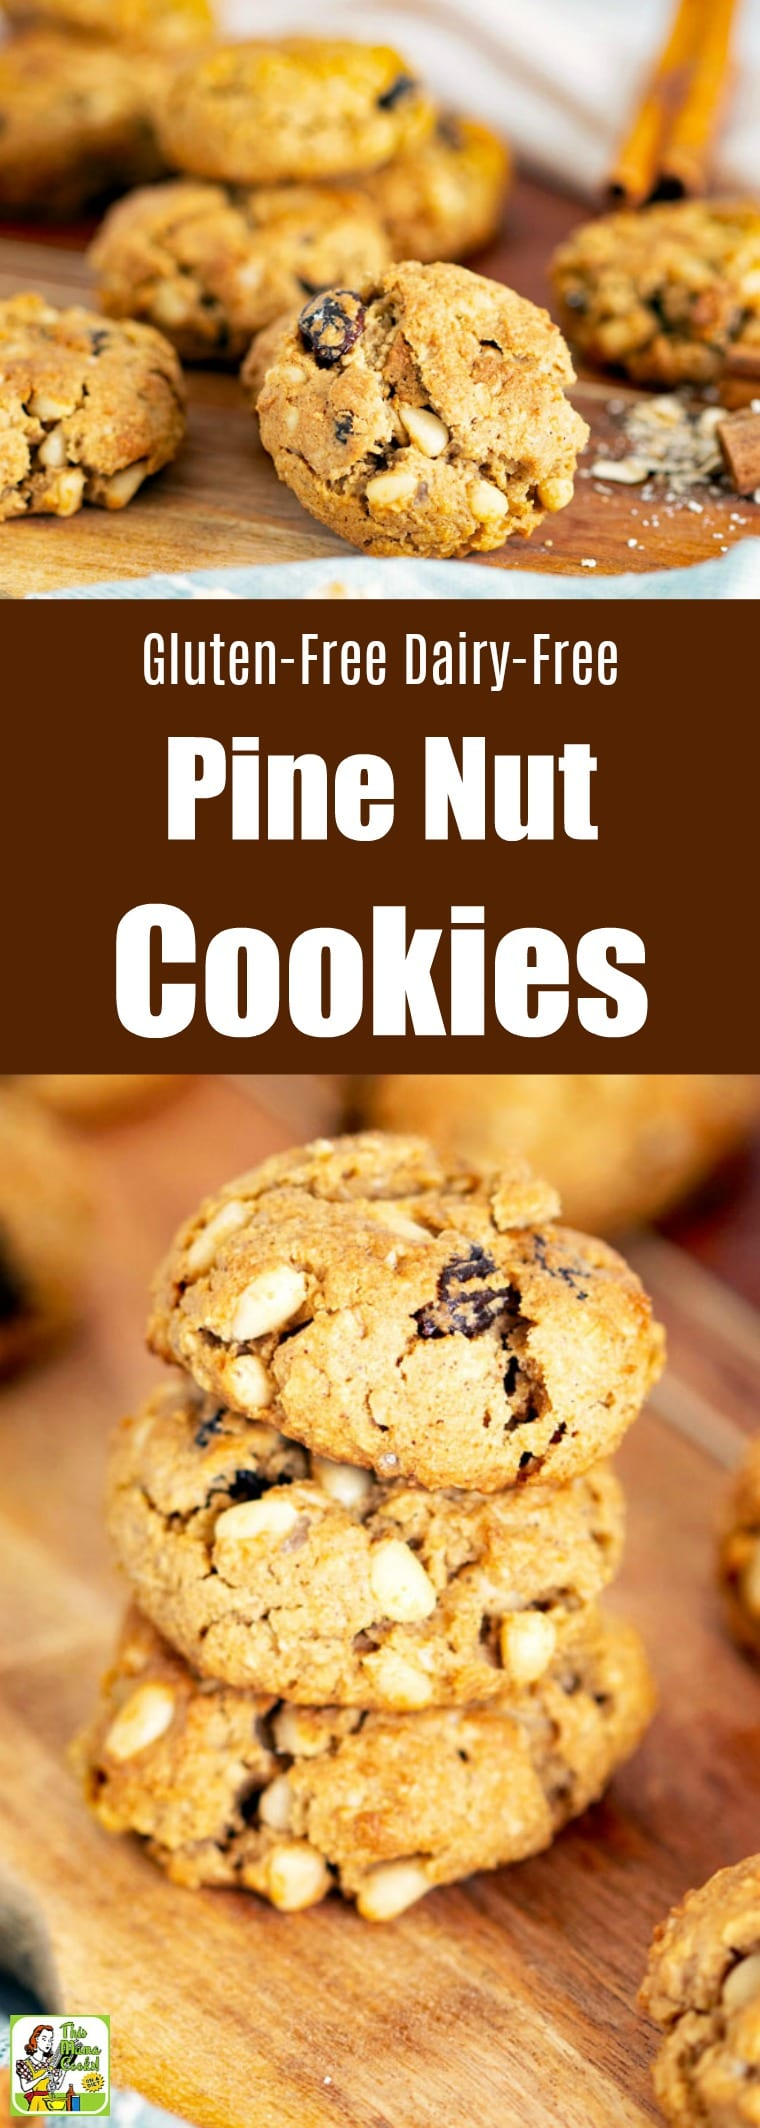 Gluten-Free Dairy-Free Pine Nut Cookies Recipe